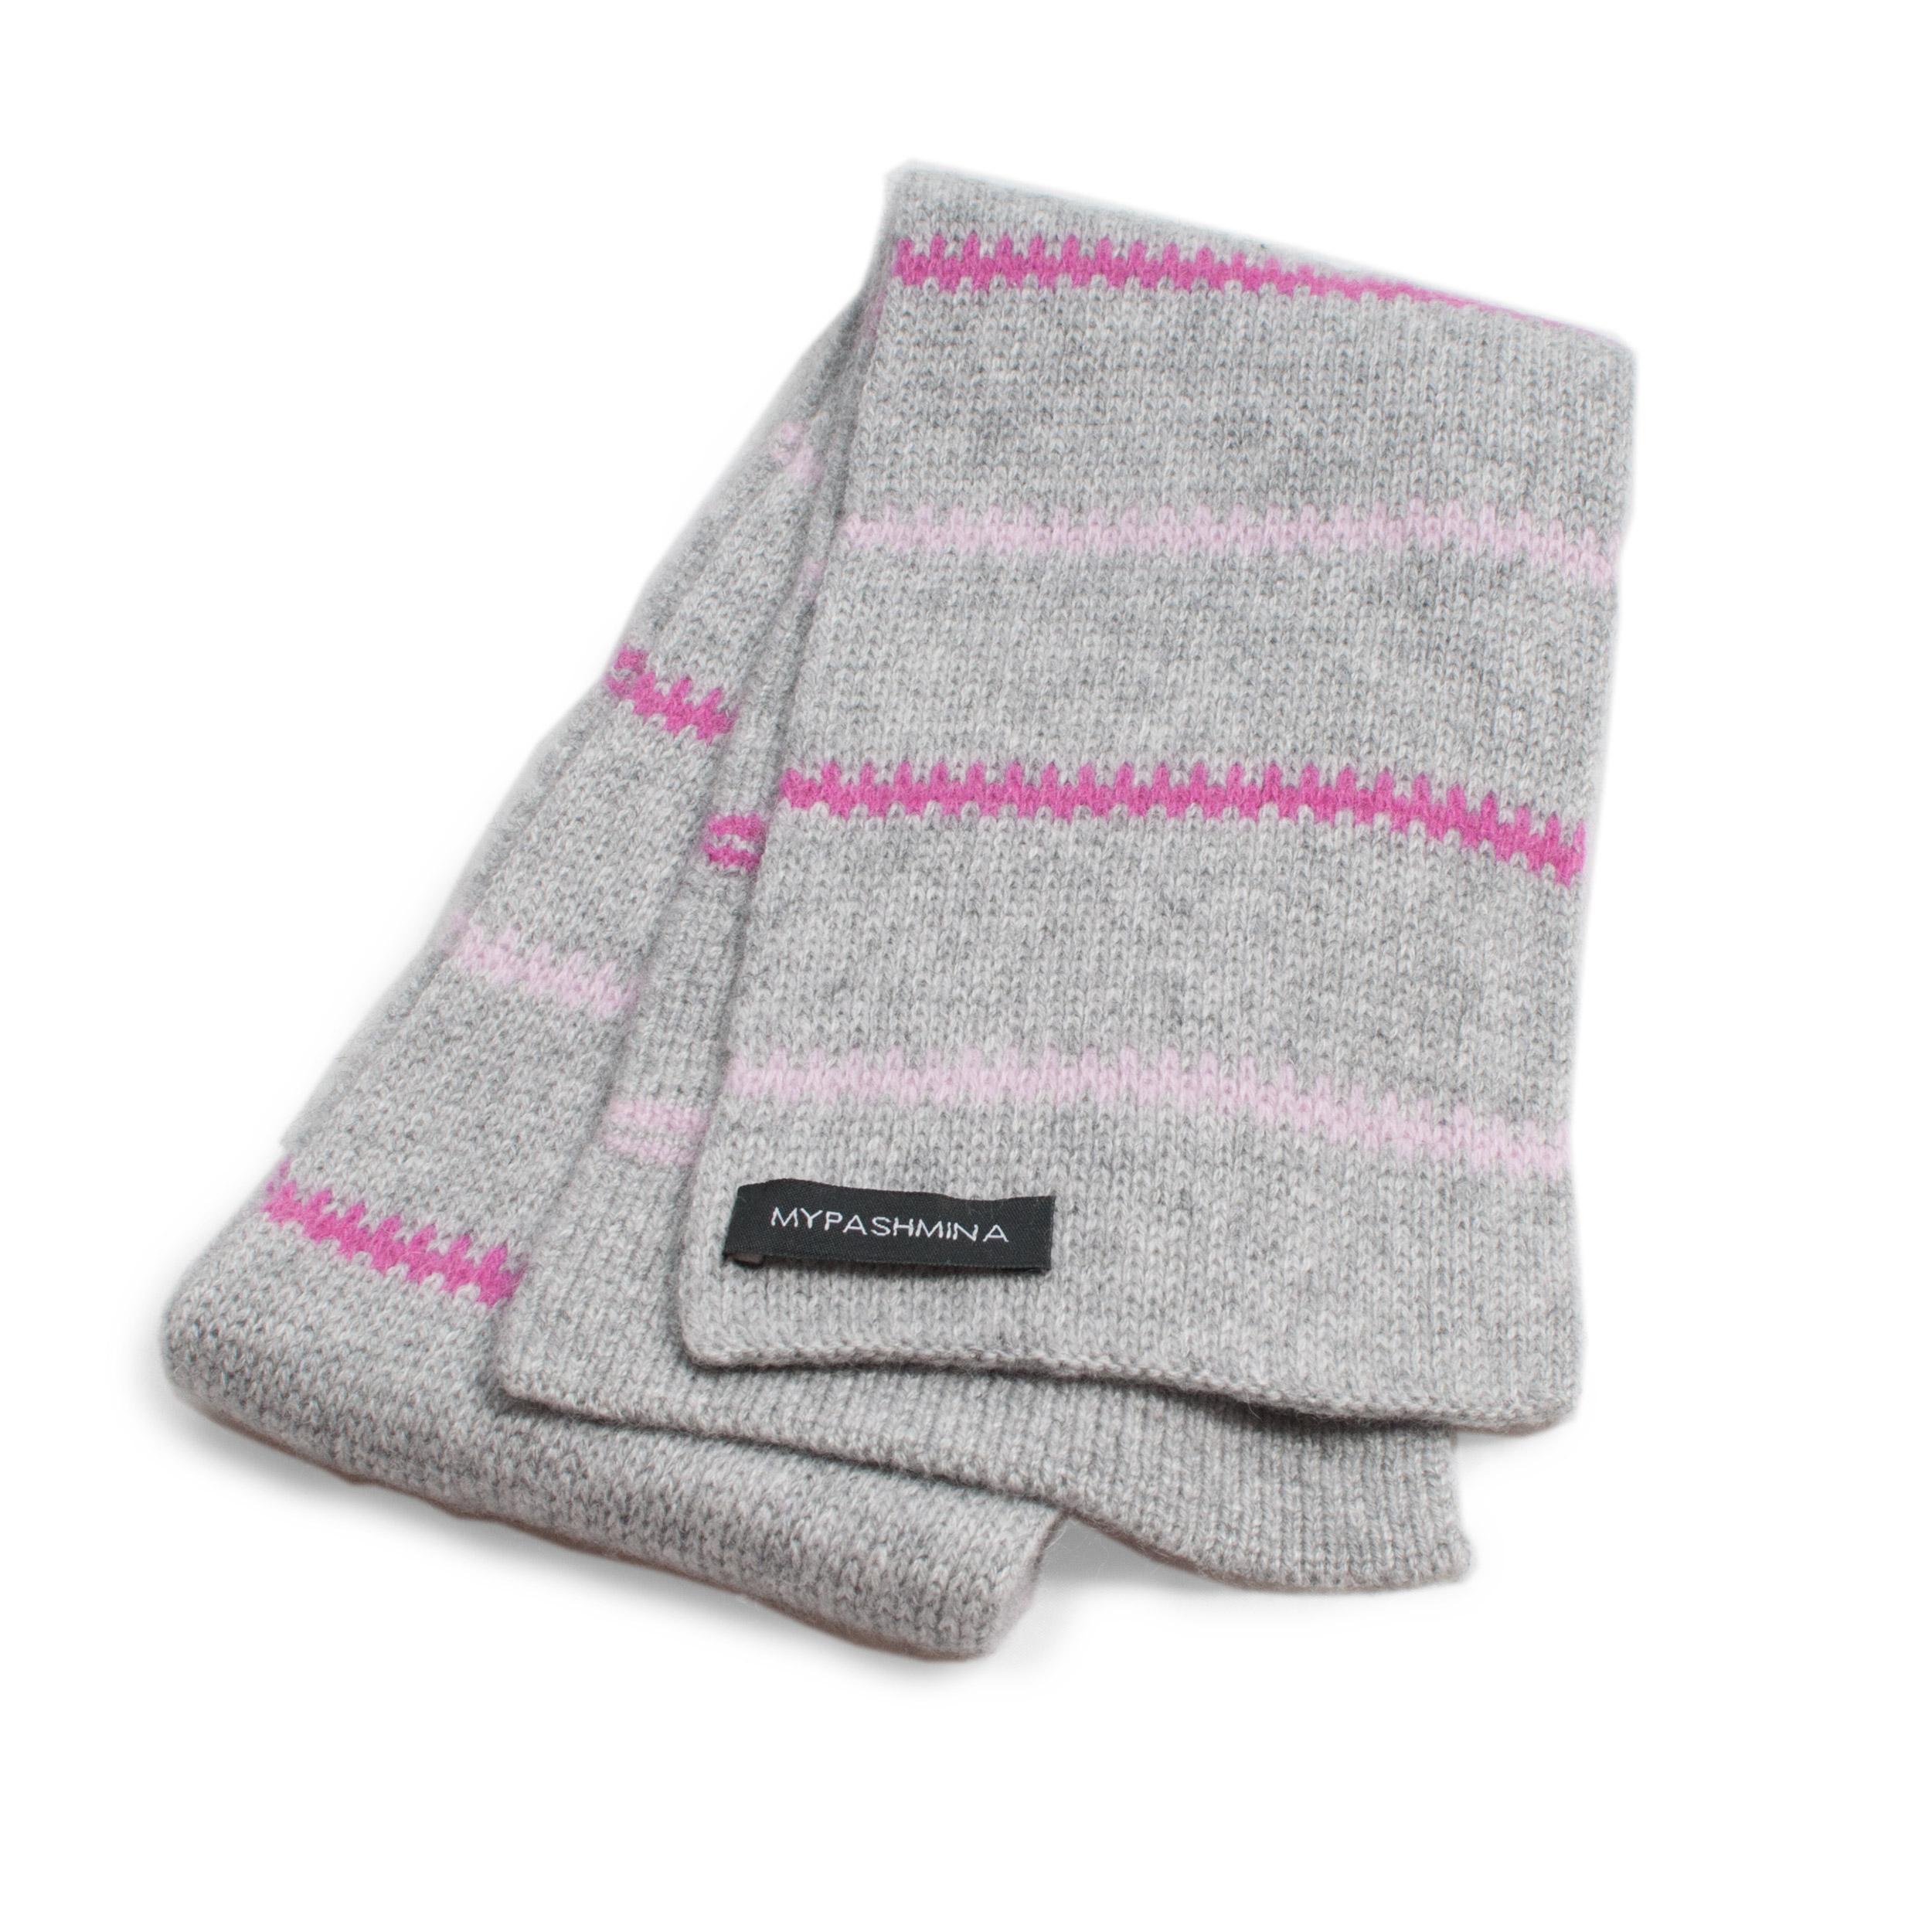 Buy Pippi-halsduk i kashmir – grå rosa Online - Mypashmina.se bf49ea918df77